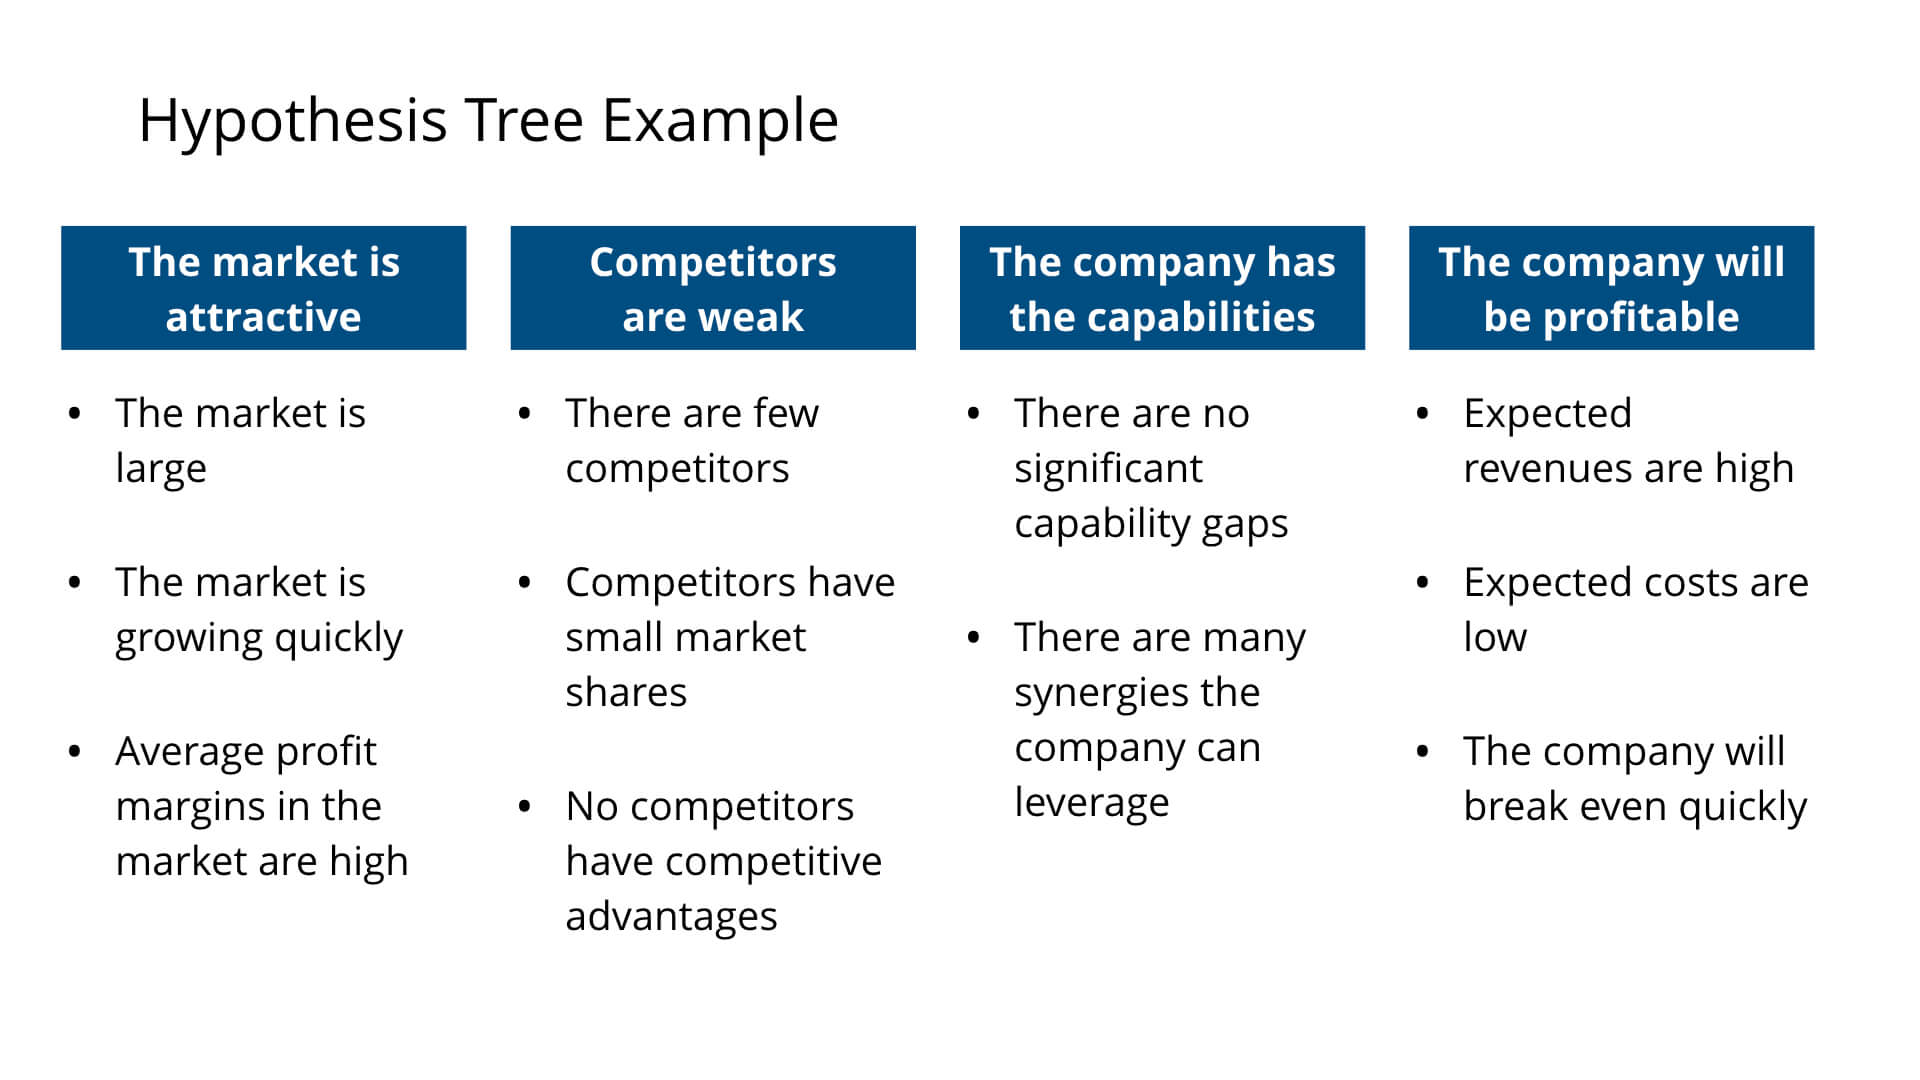 Hypothesis Tree Example